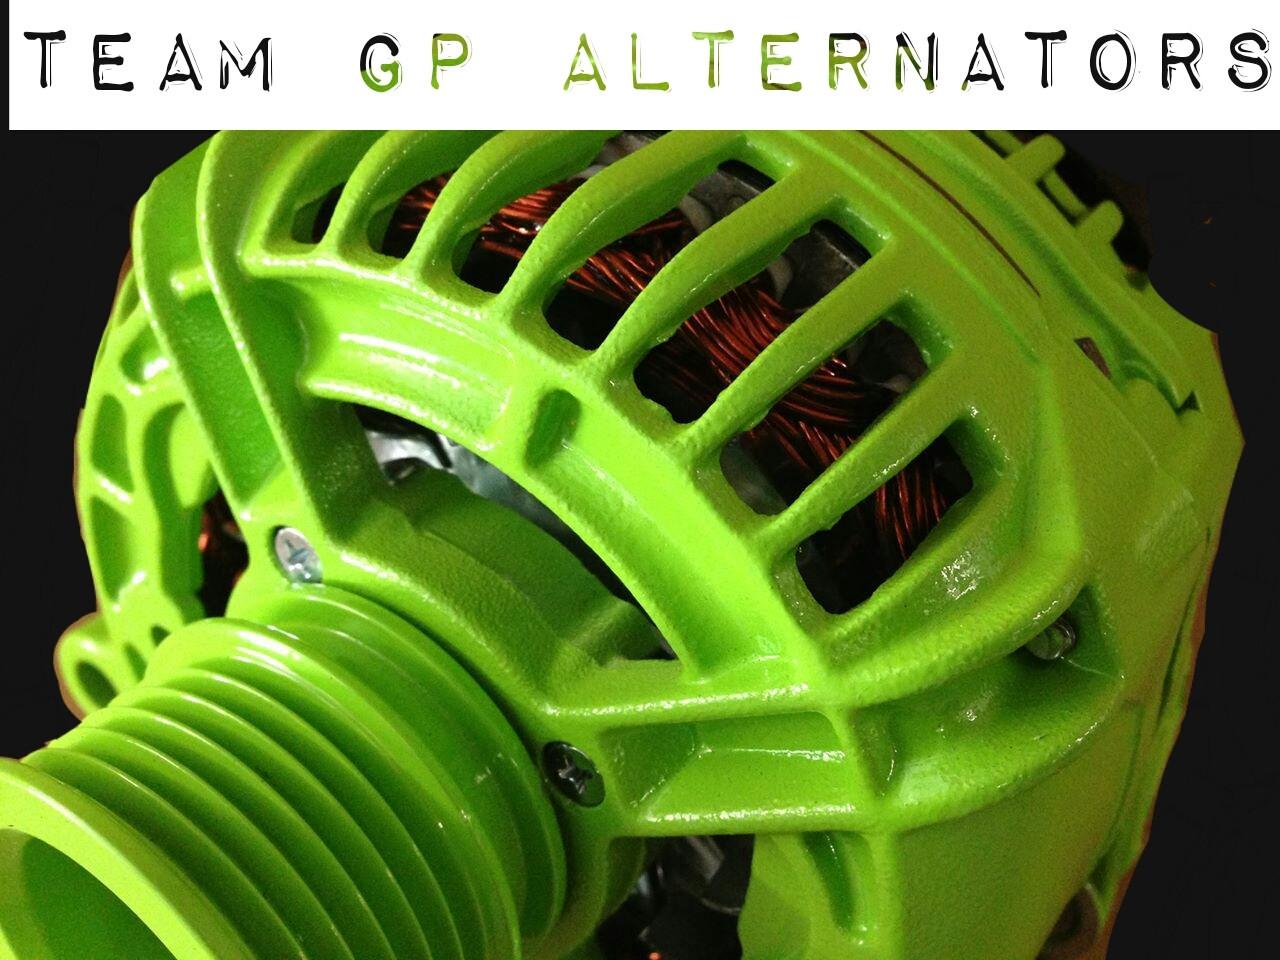 SUBARU LEGACY 2.5L NON TURBO -2005- 220AMP TEAM GP Alternator